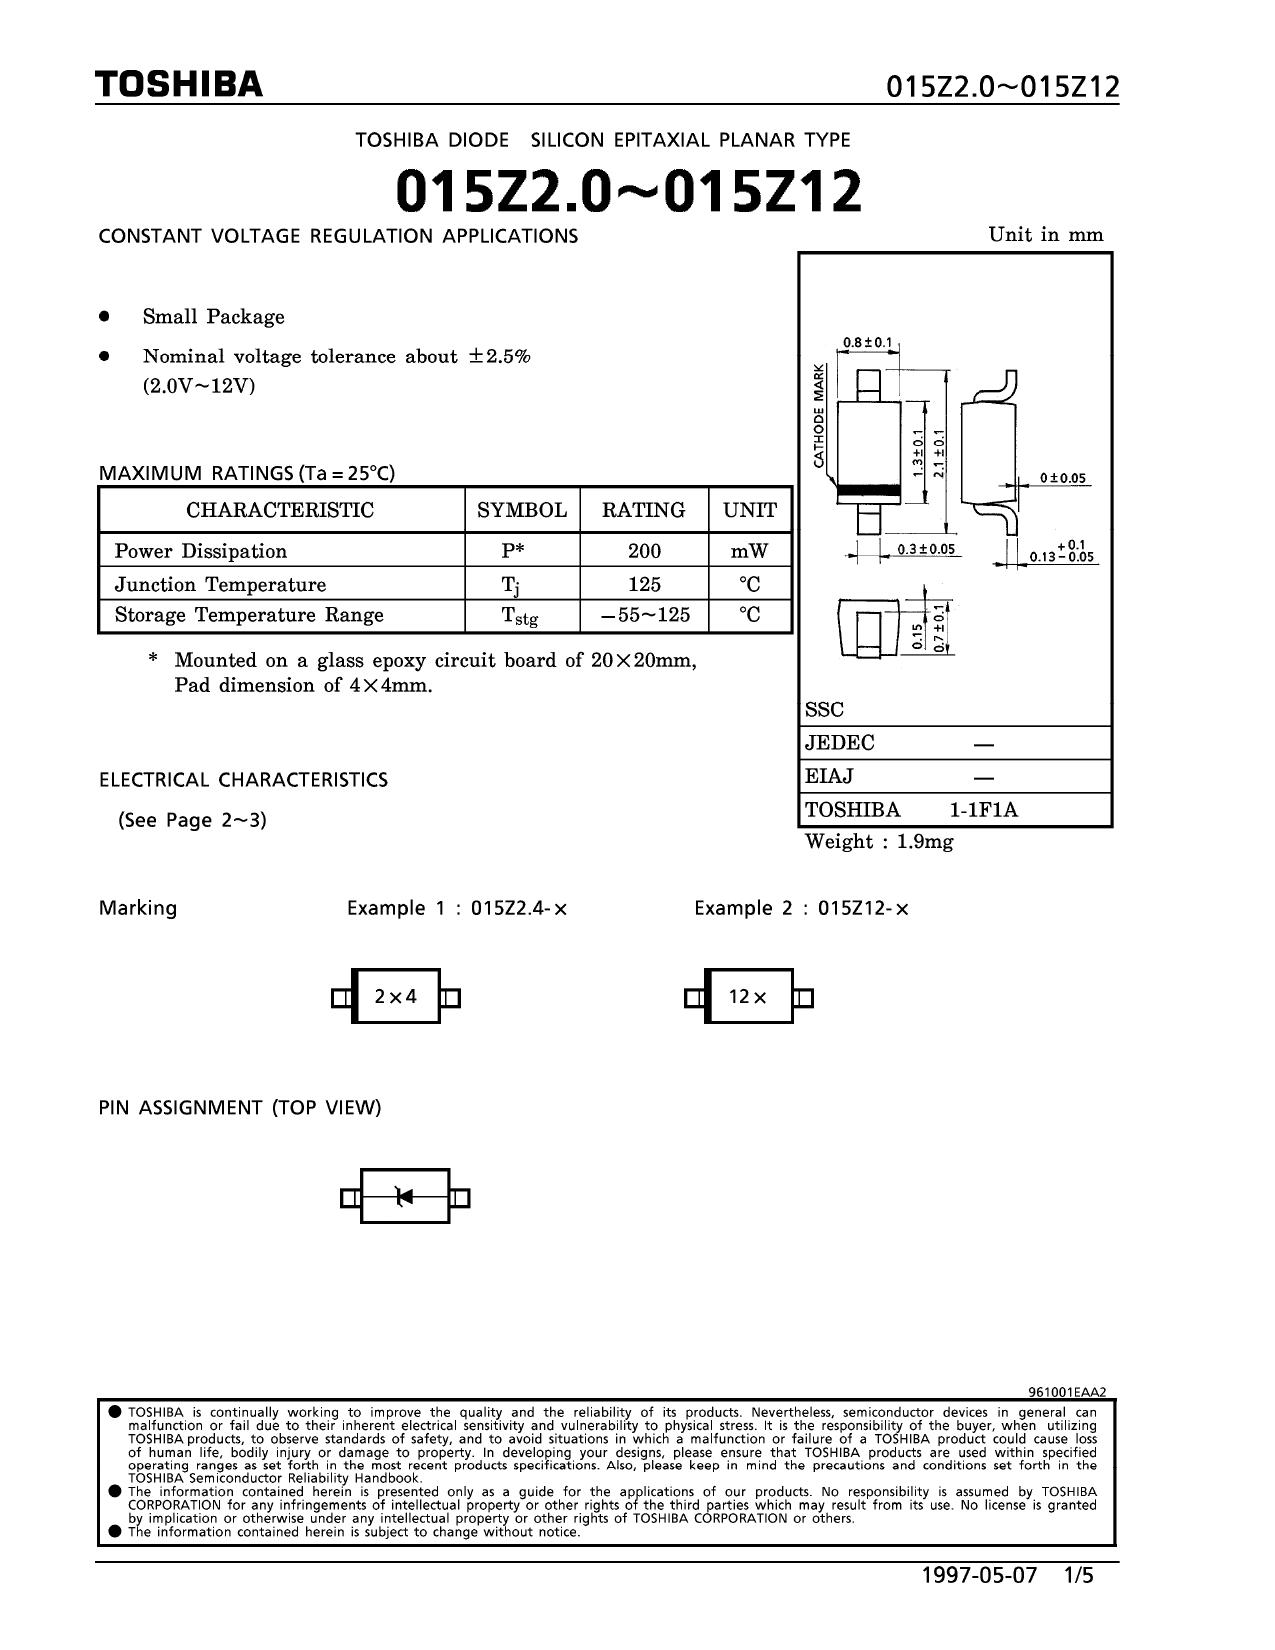 015Z3.0 datasheet